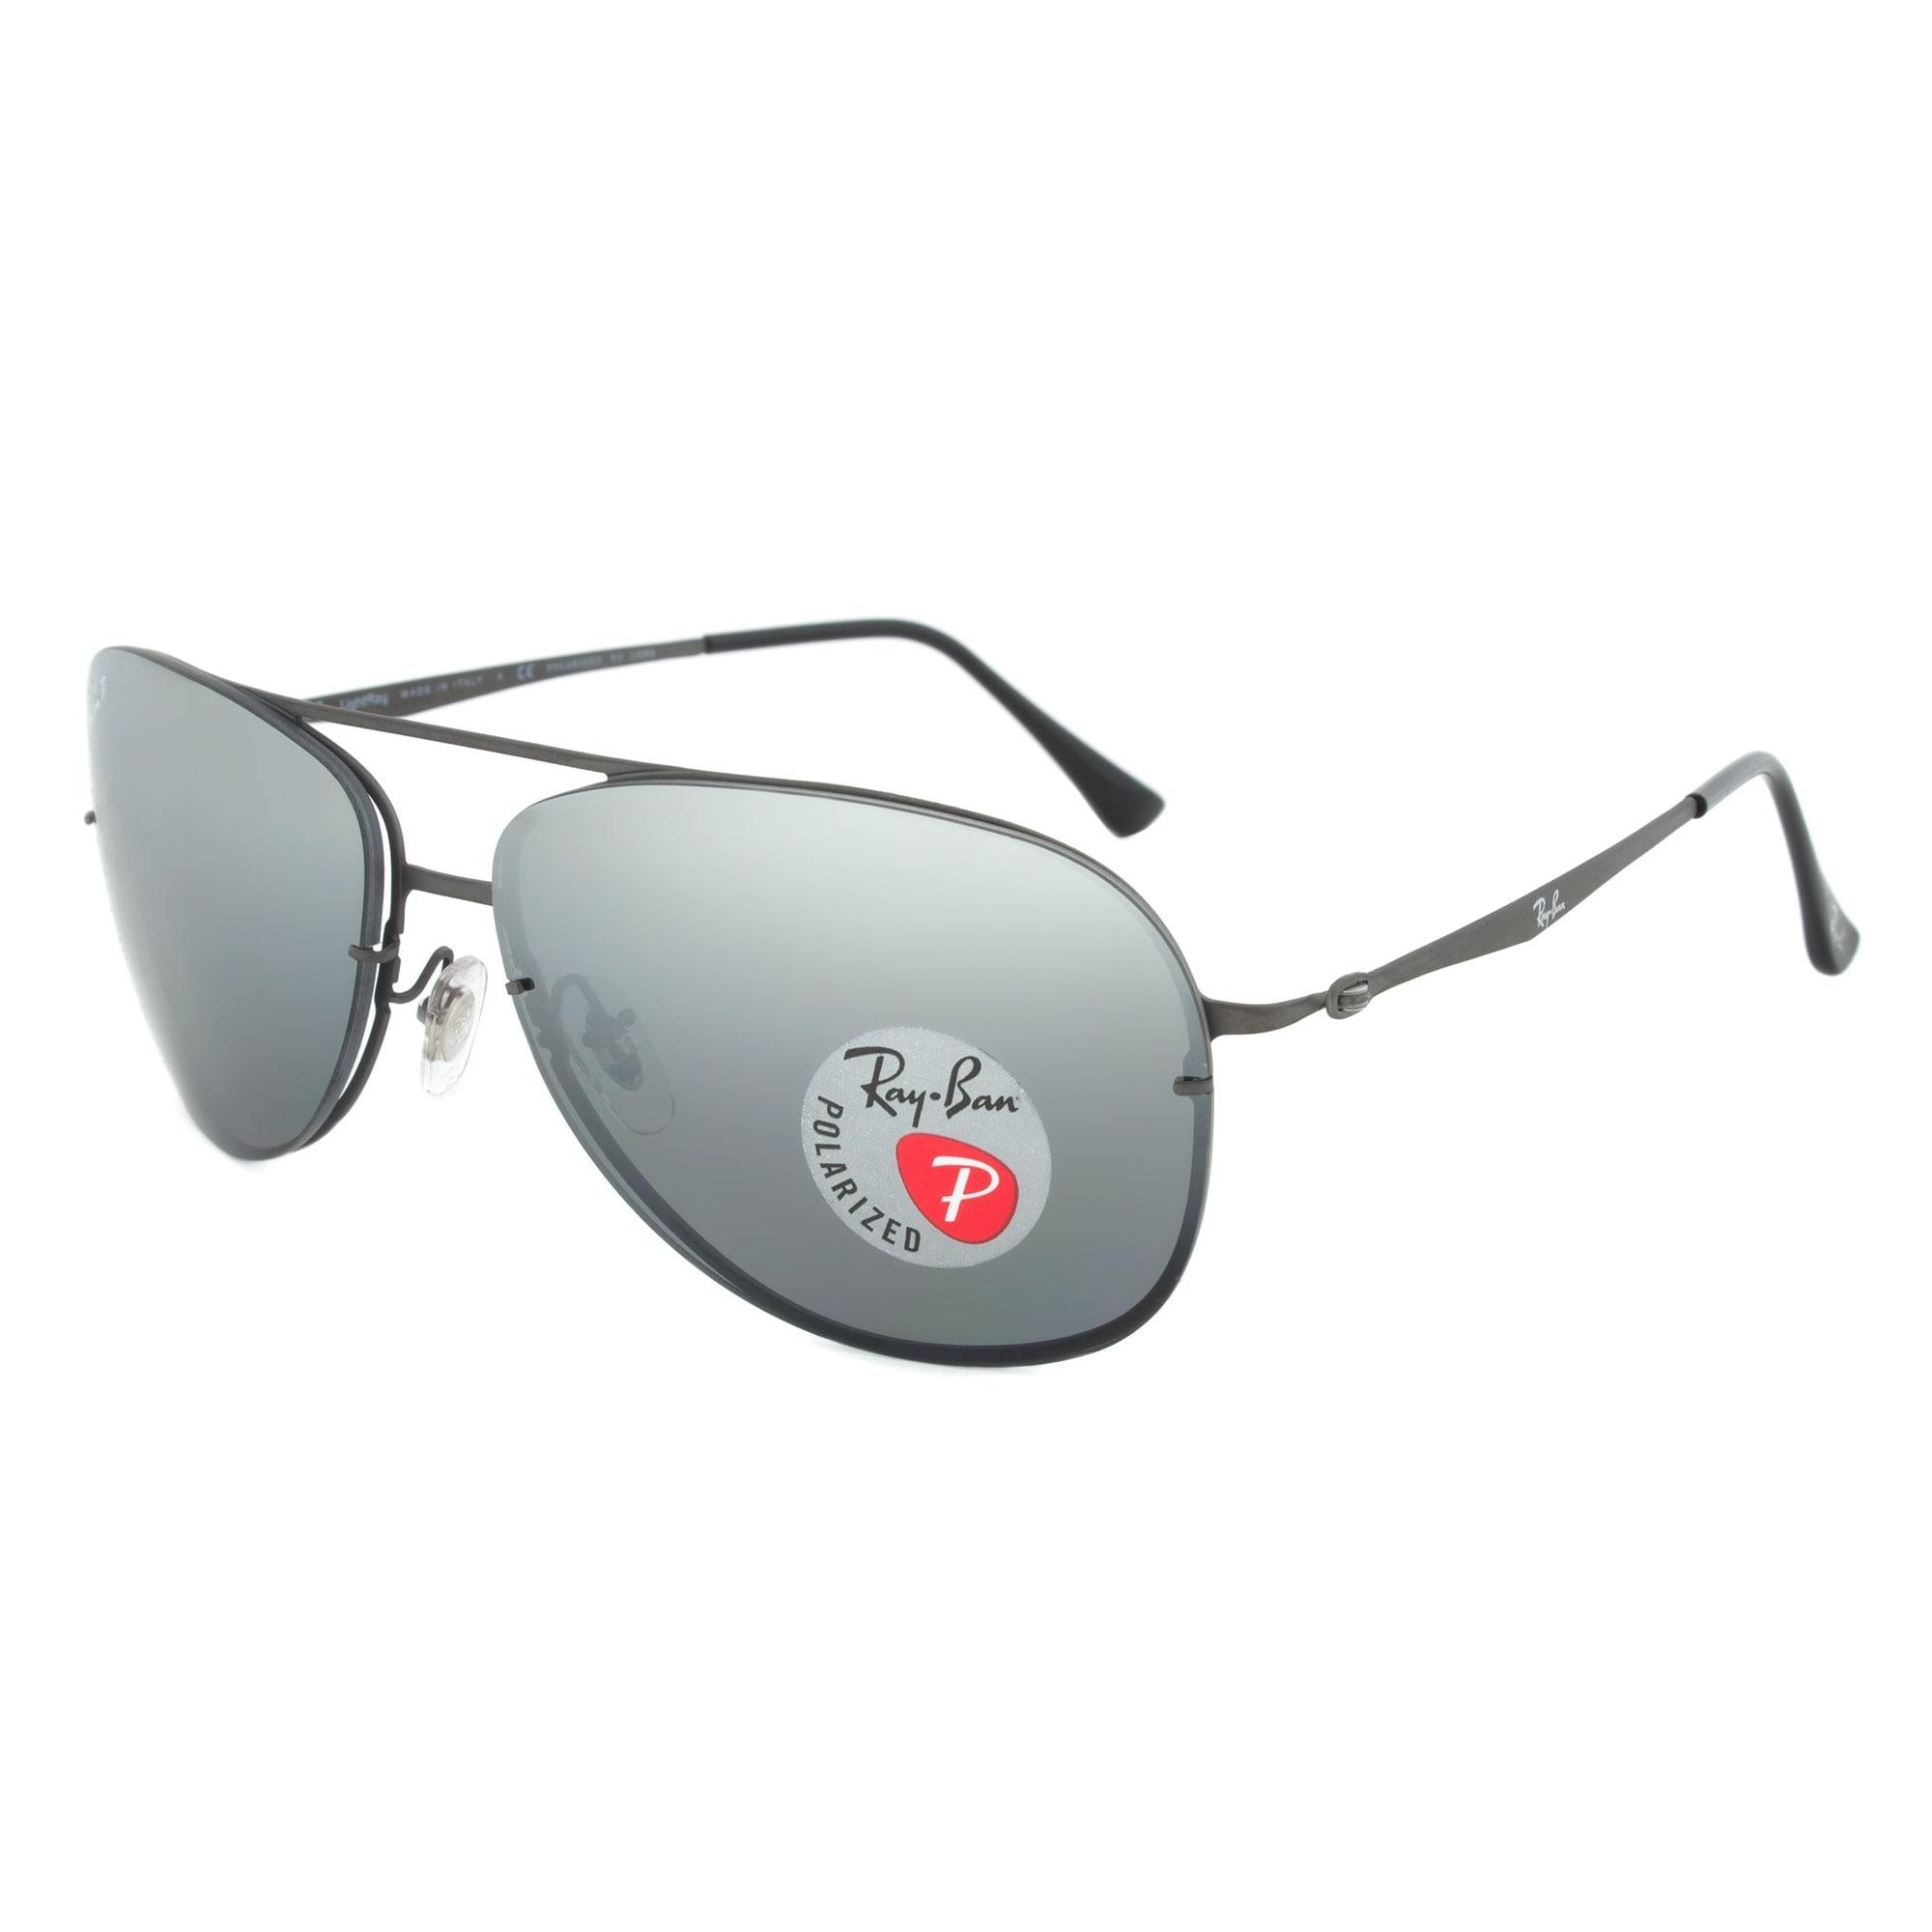 Shop Ray-Ban RB 8052 154/82 Polarized Aviator Sunglasses - Gunmetal ...